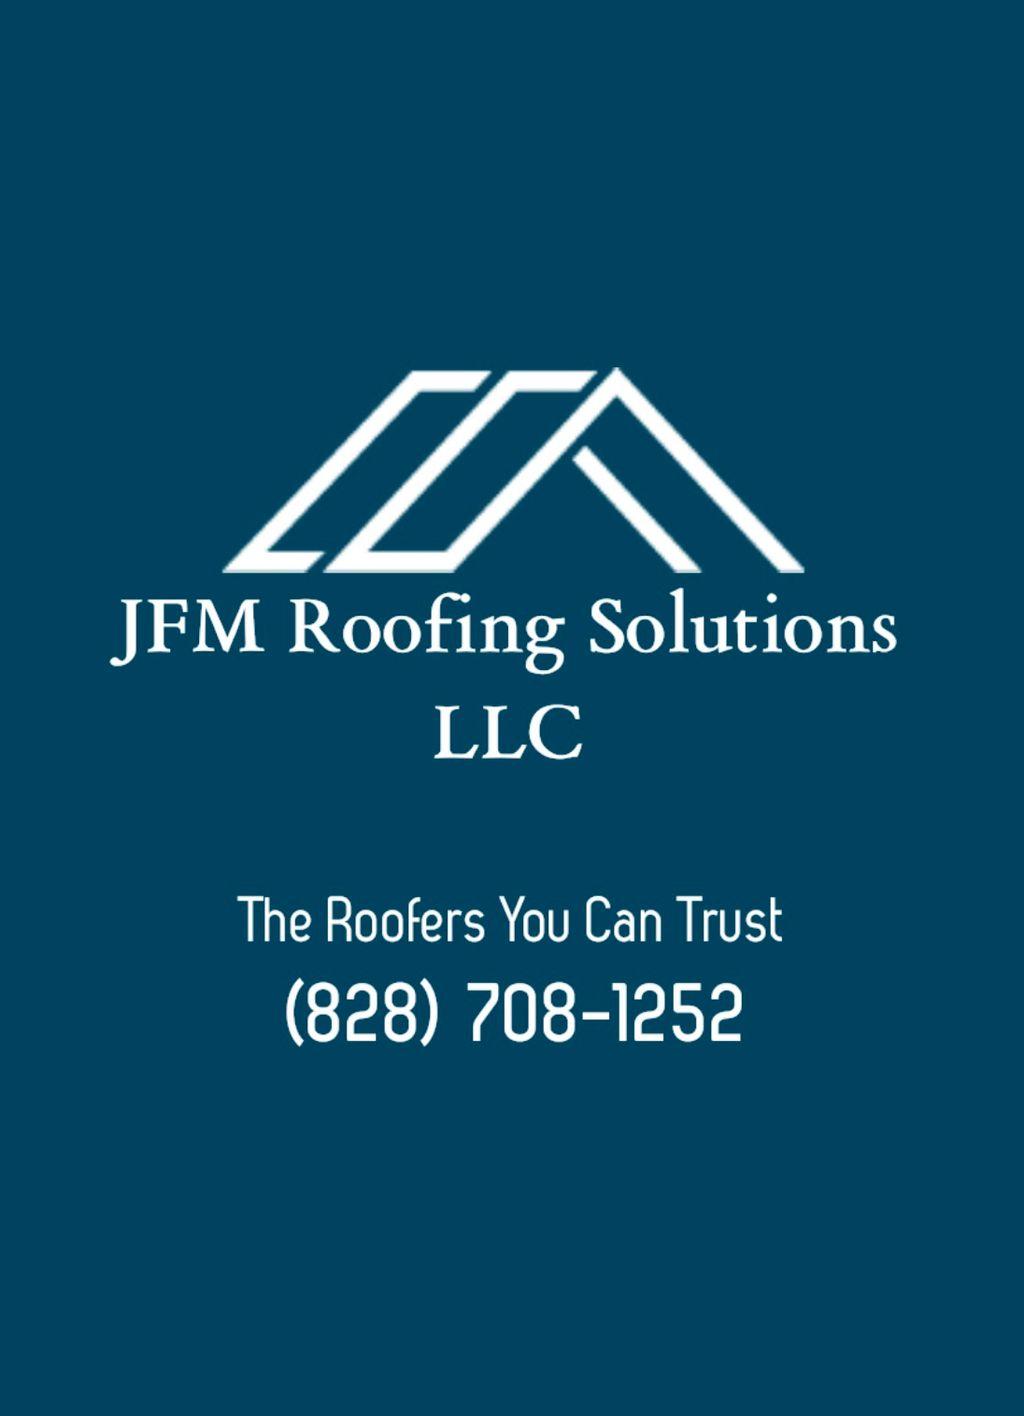 JFM Roofing Solutions LLC